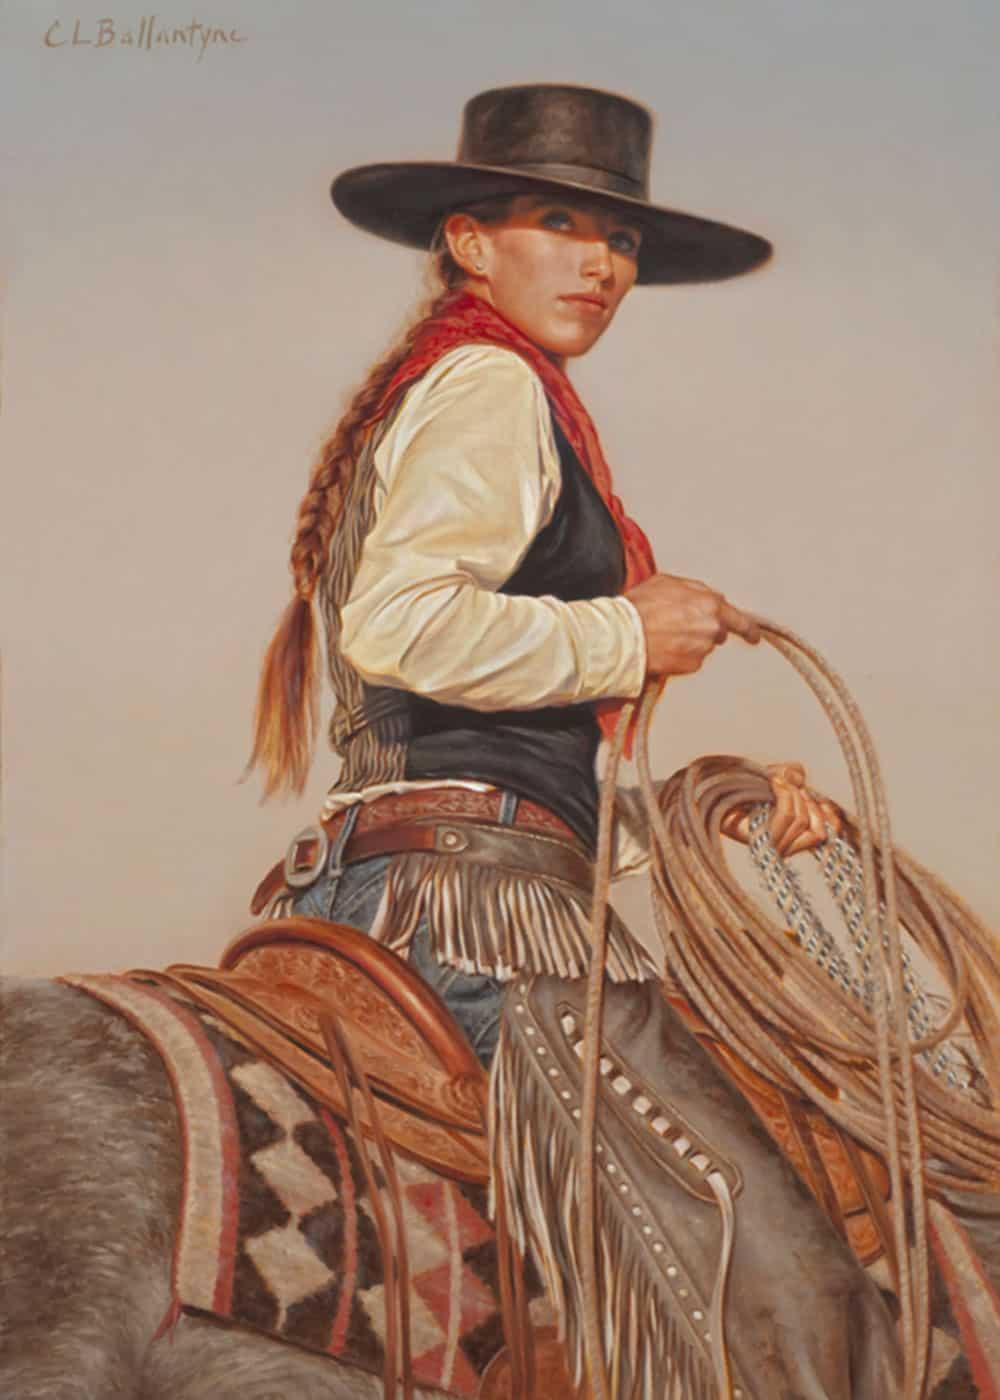 carrie ballantyne buckaroo diamonds and pearls cowgirl magazine